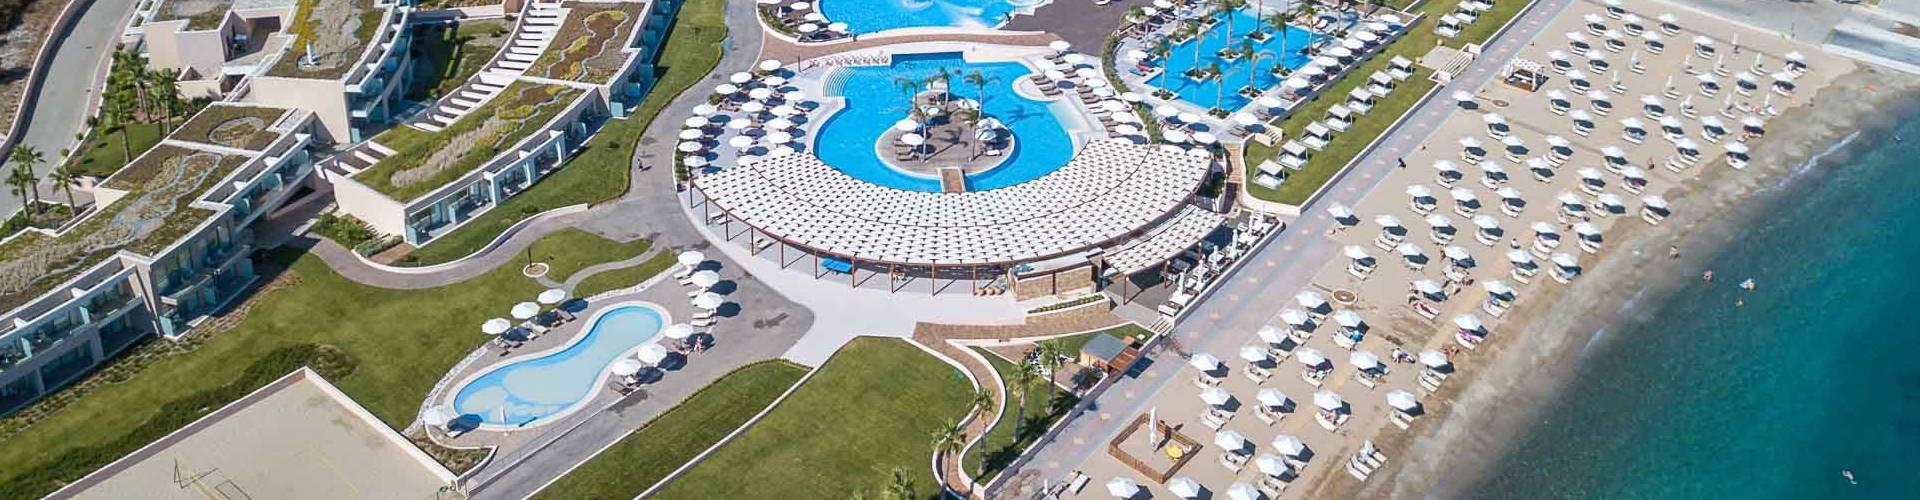 Mirragio Hotel Spa